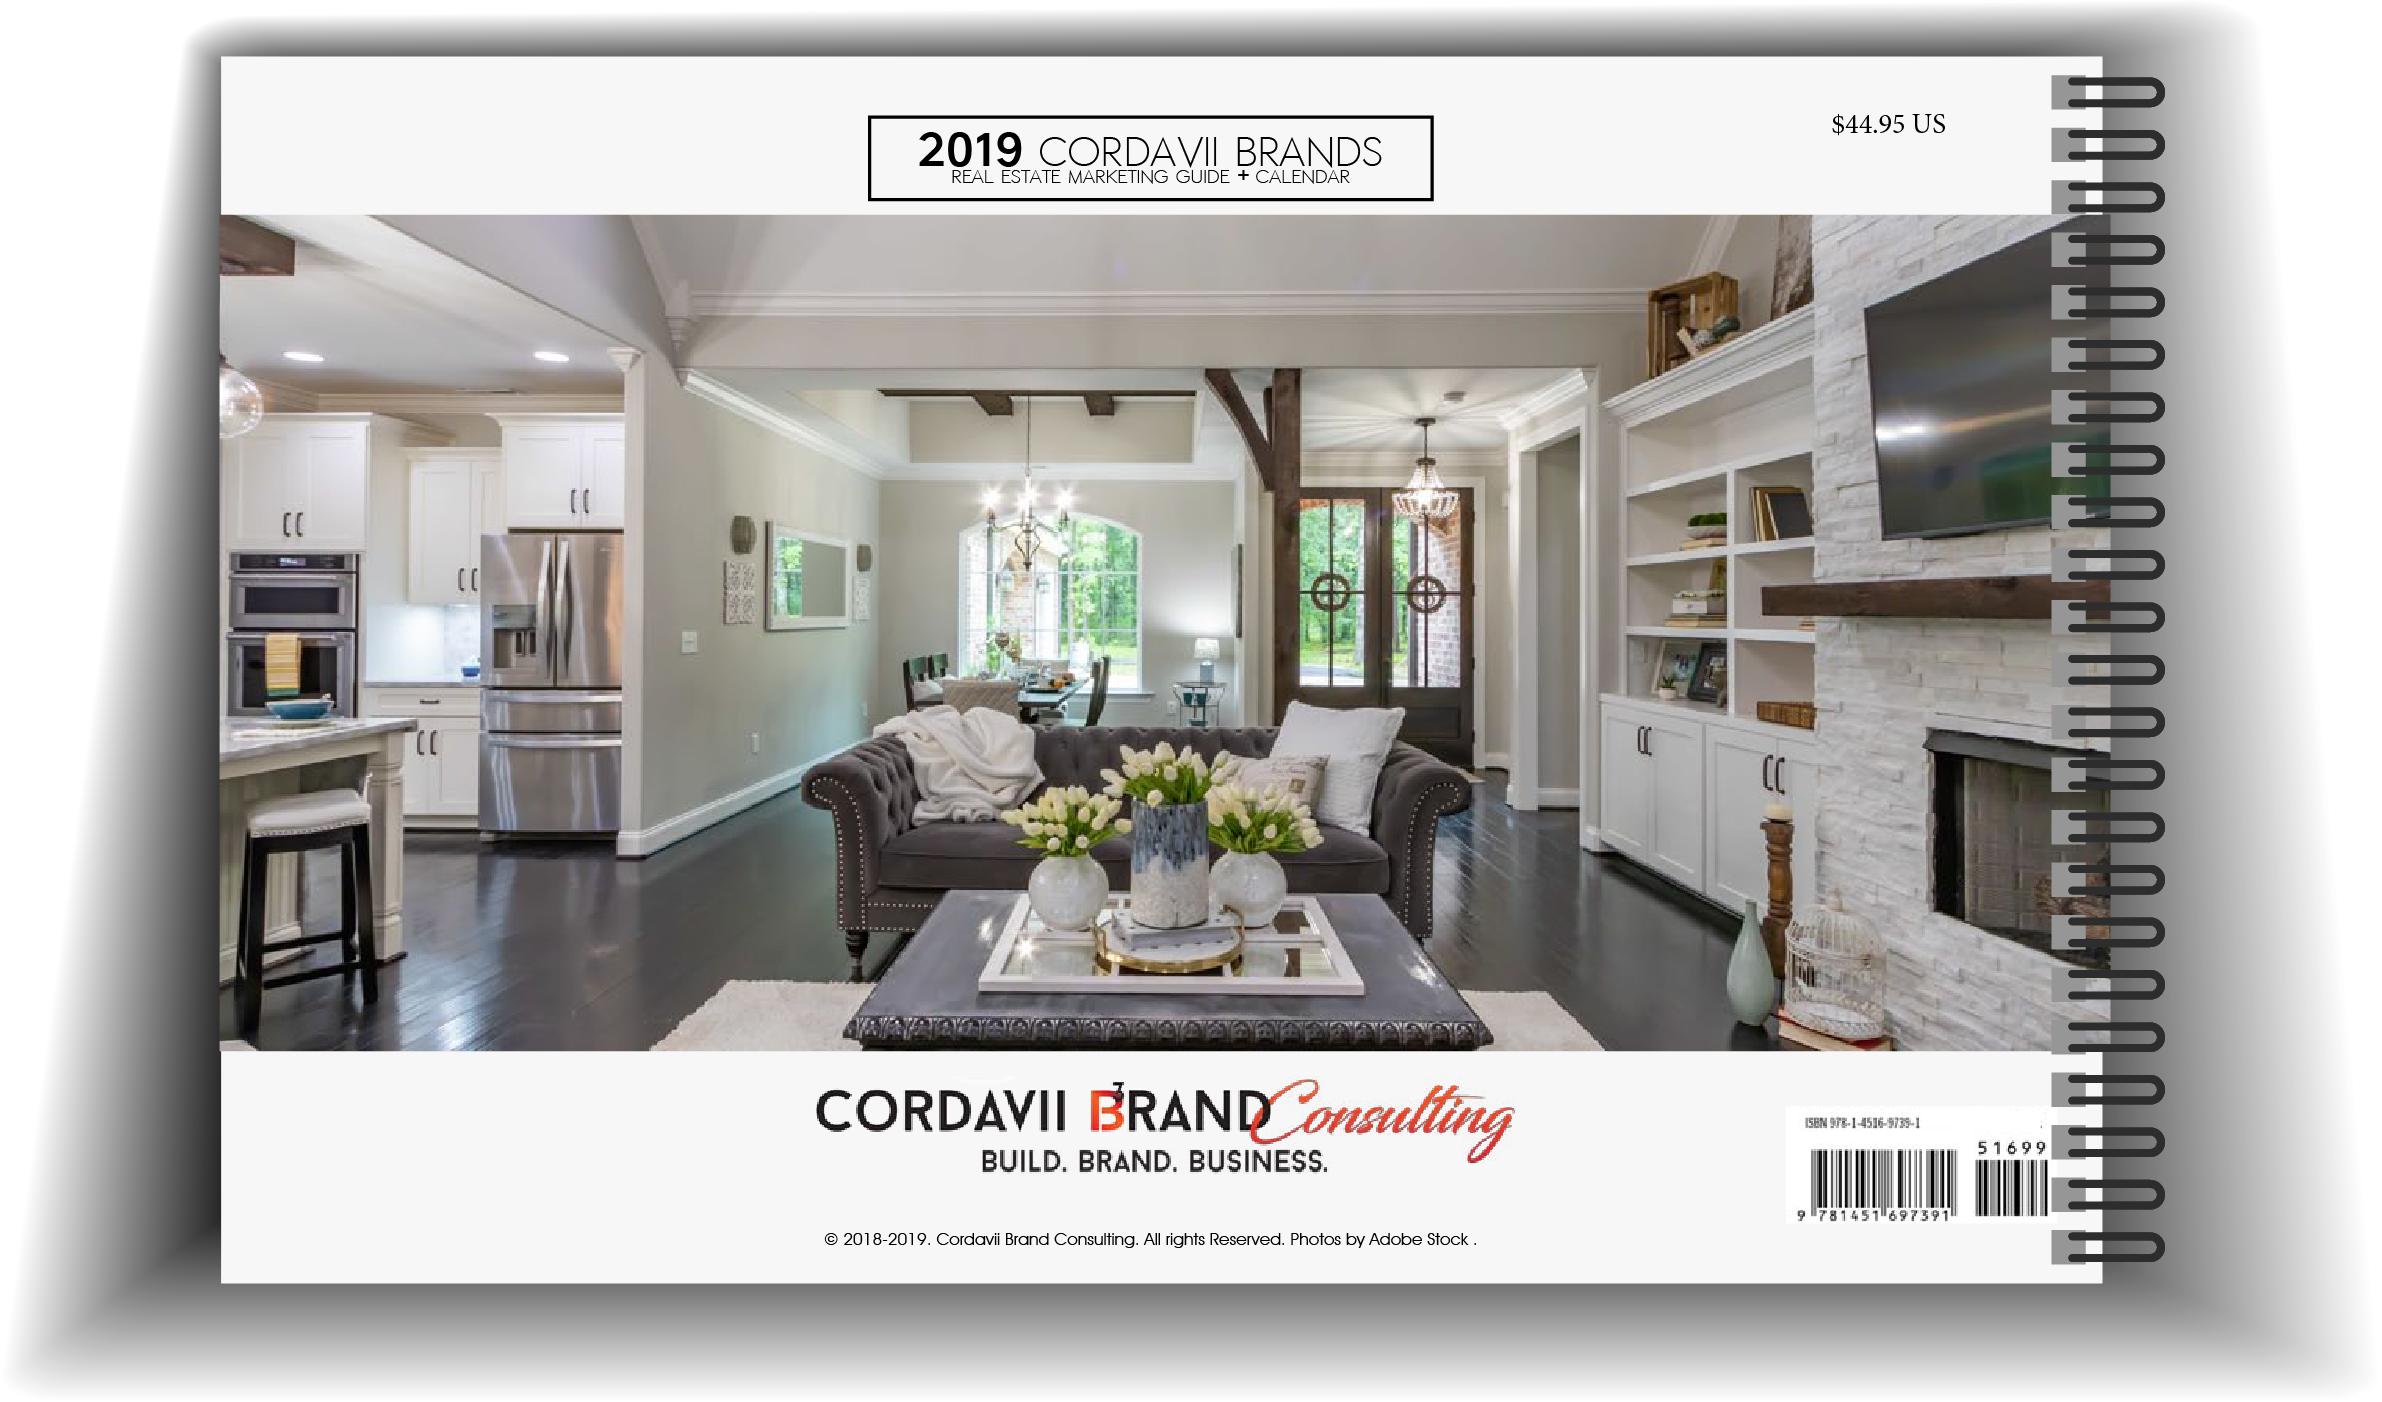 Cordavii 2019 Real Estate Marketing Calendar Back Cover